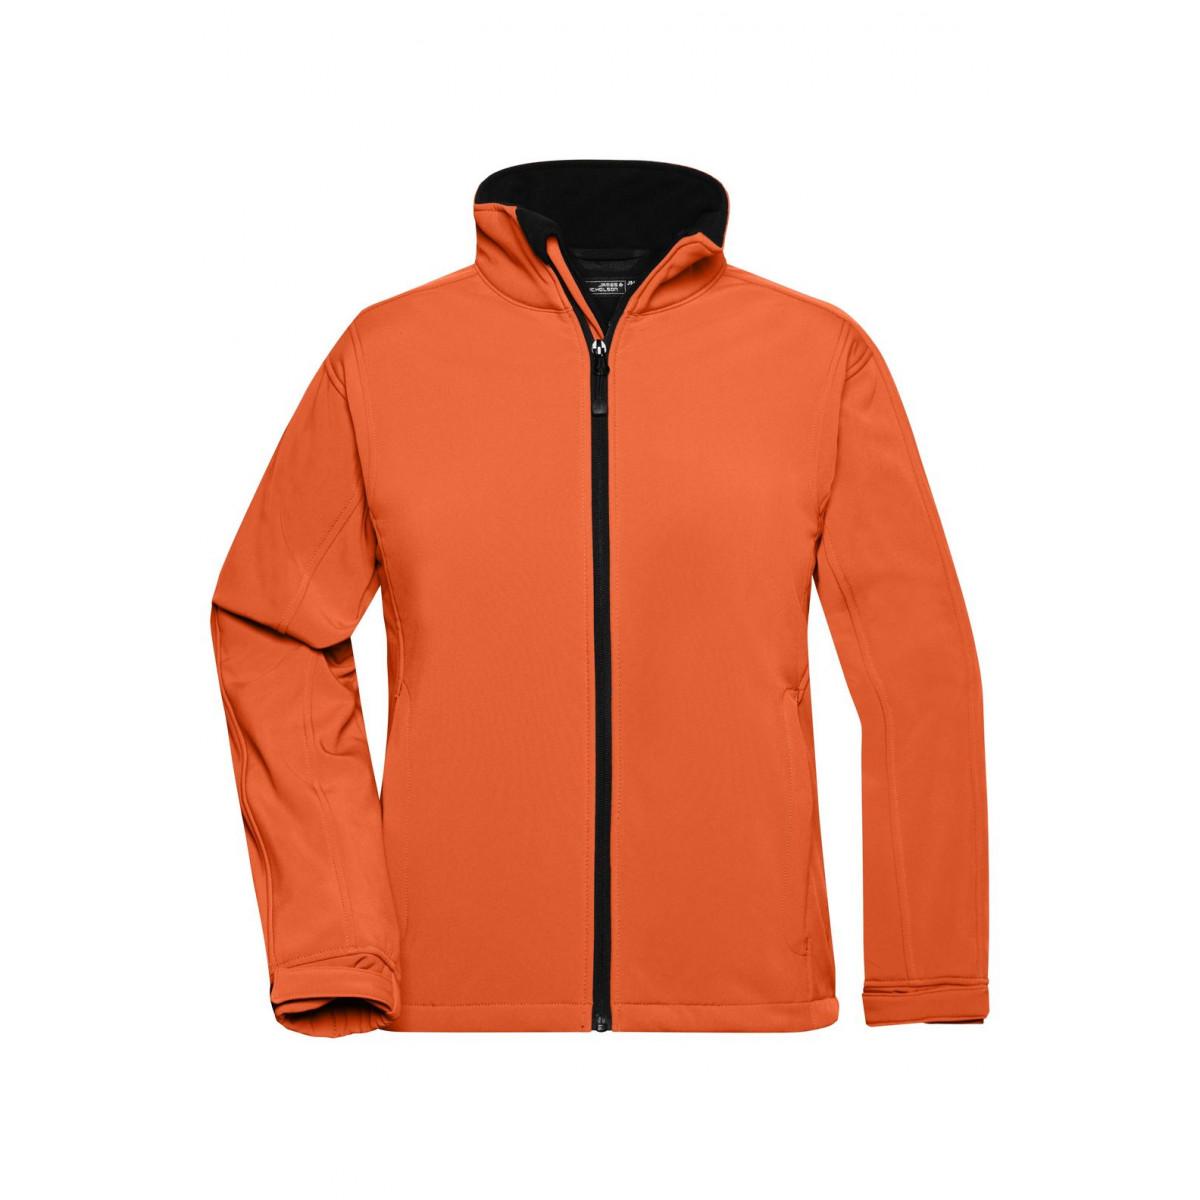 Куртка женская JN137 Ladies Softshell Jacket - Оранжевый